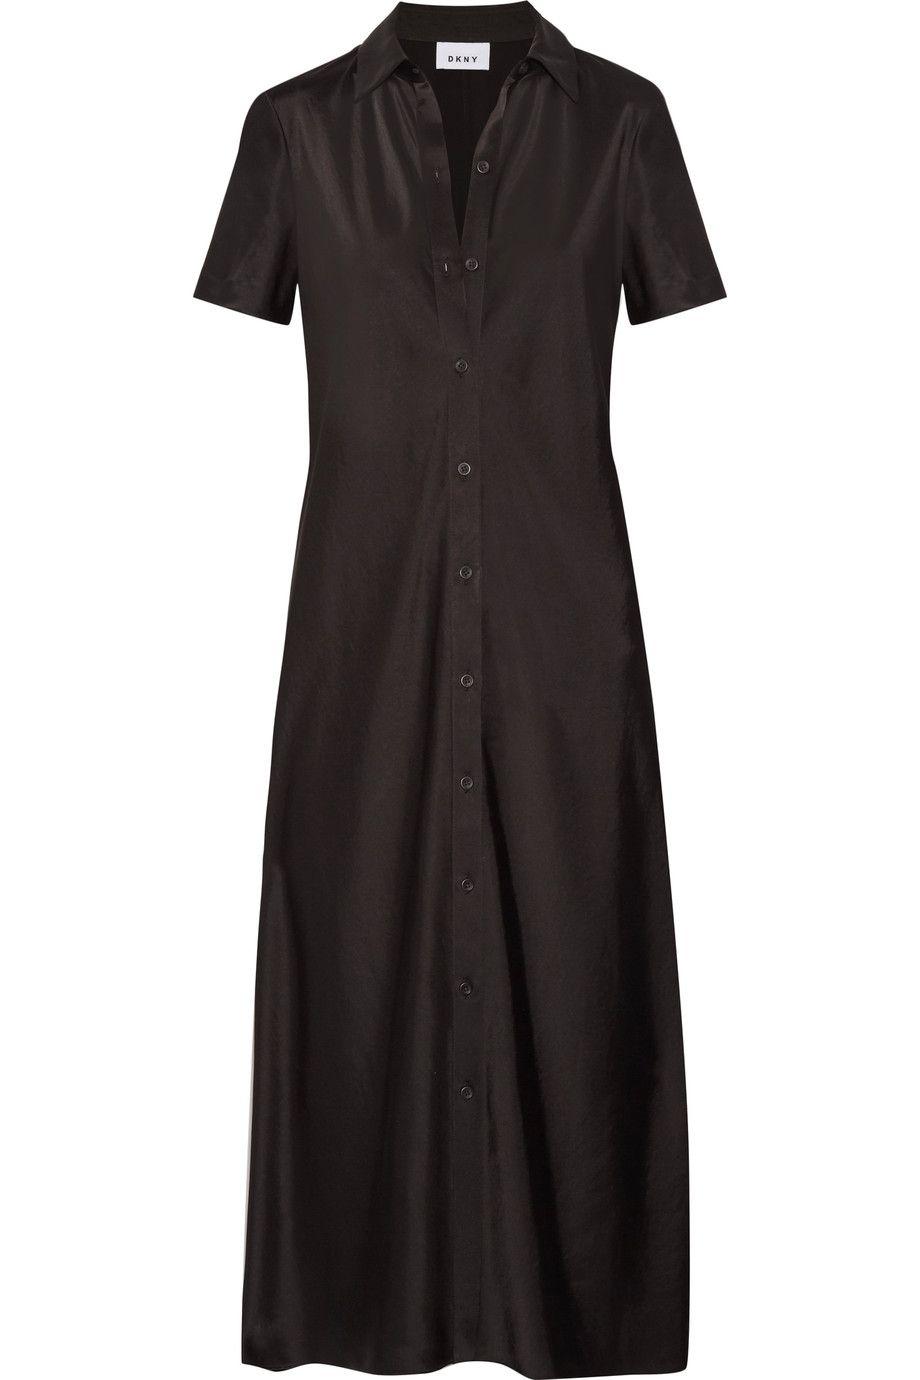 #PopbelaOOTD: Shirtdress Santai untuk Kamu Pecinta Gaya Kasual